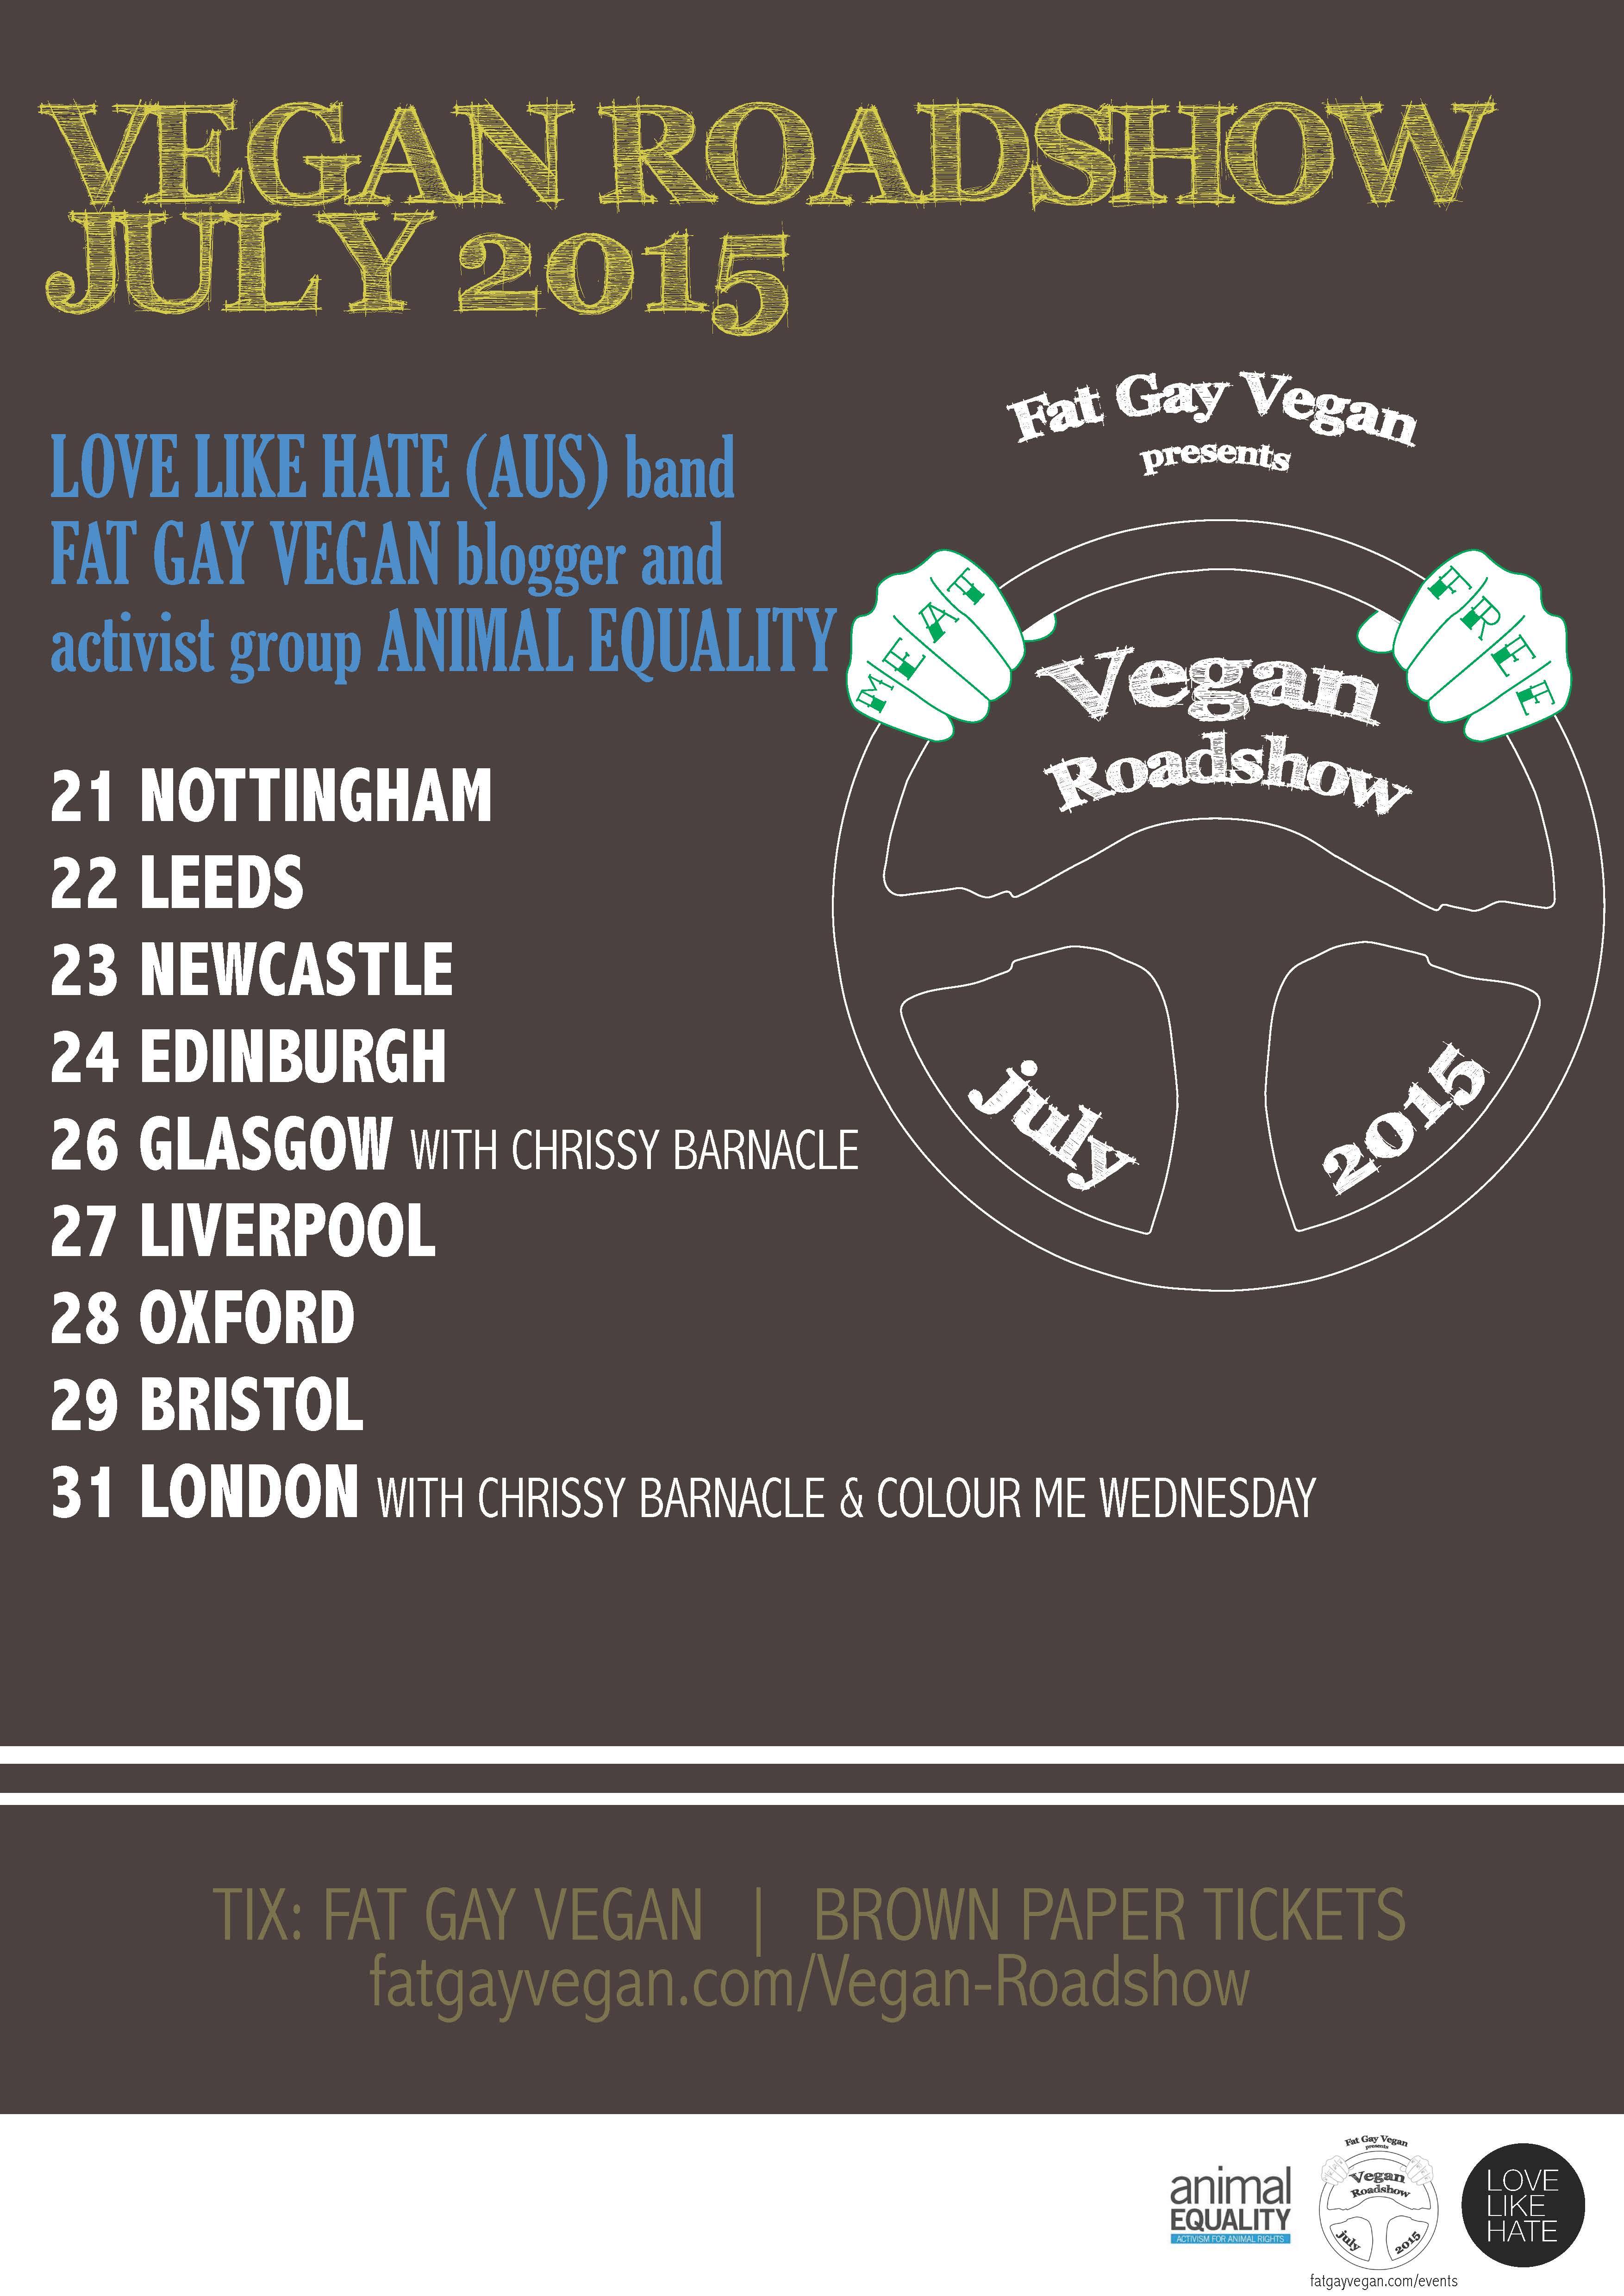 http://fatgayvegan.com/wp-content/uploads/2015/08/Fat-Gay-Vegan-Roadshow-Poster.jpg